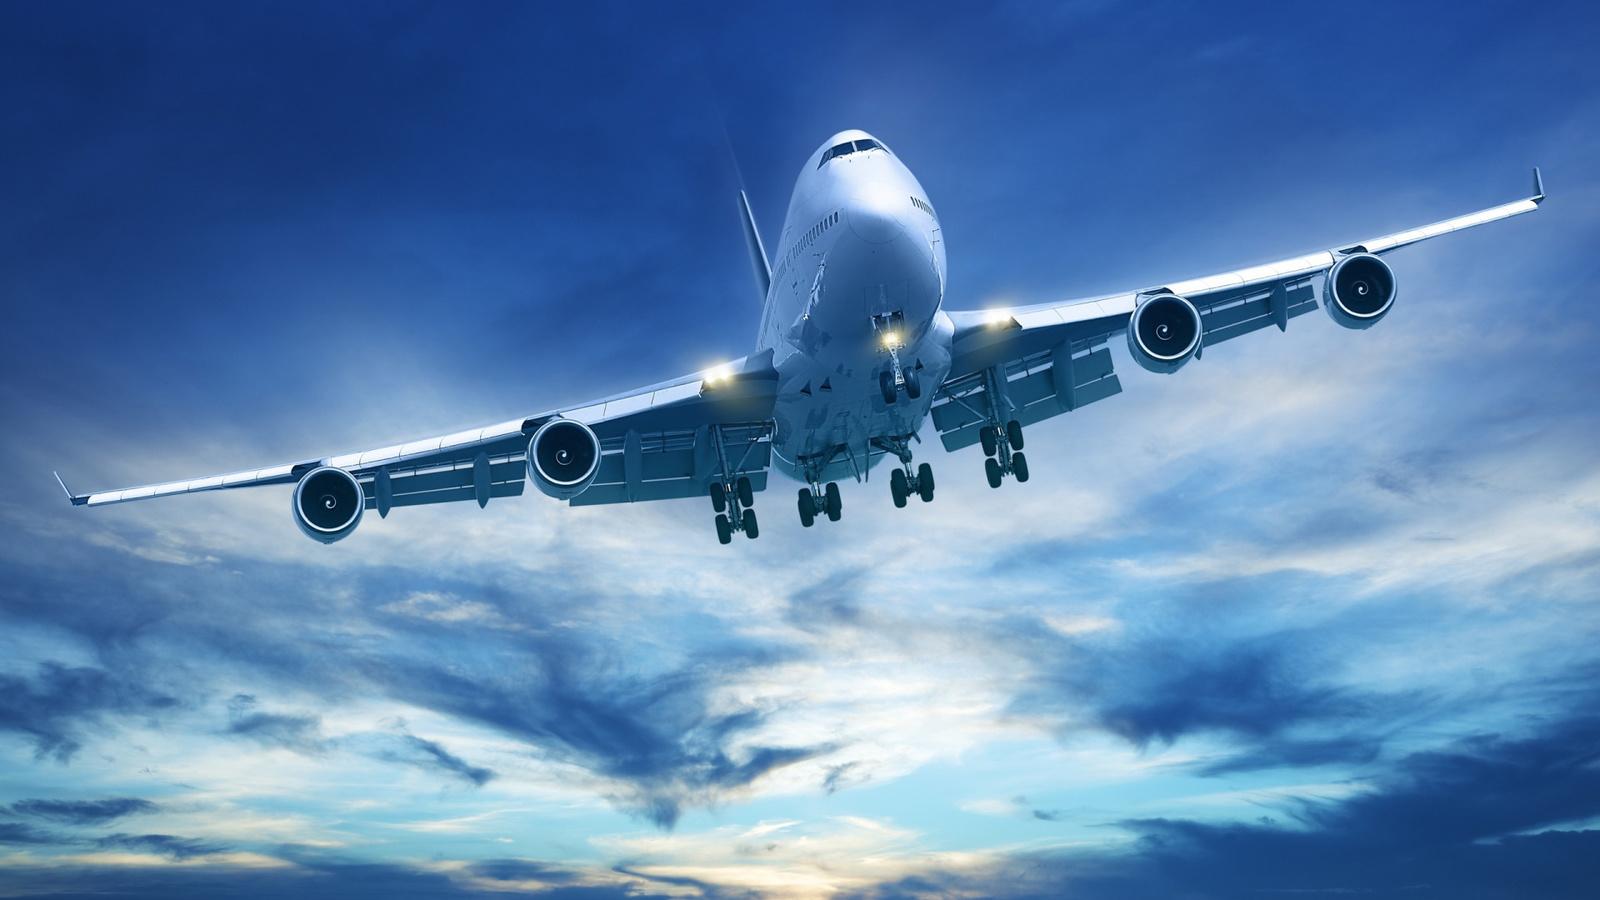 самолёт, полёт, небо